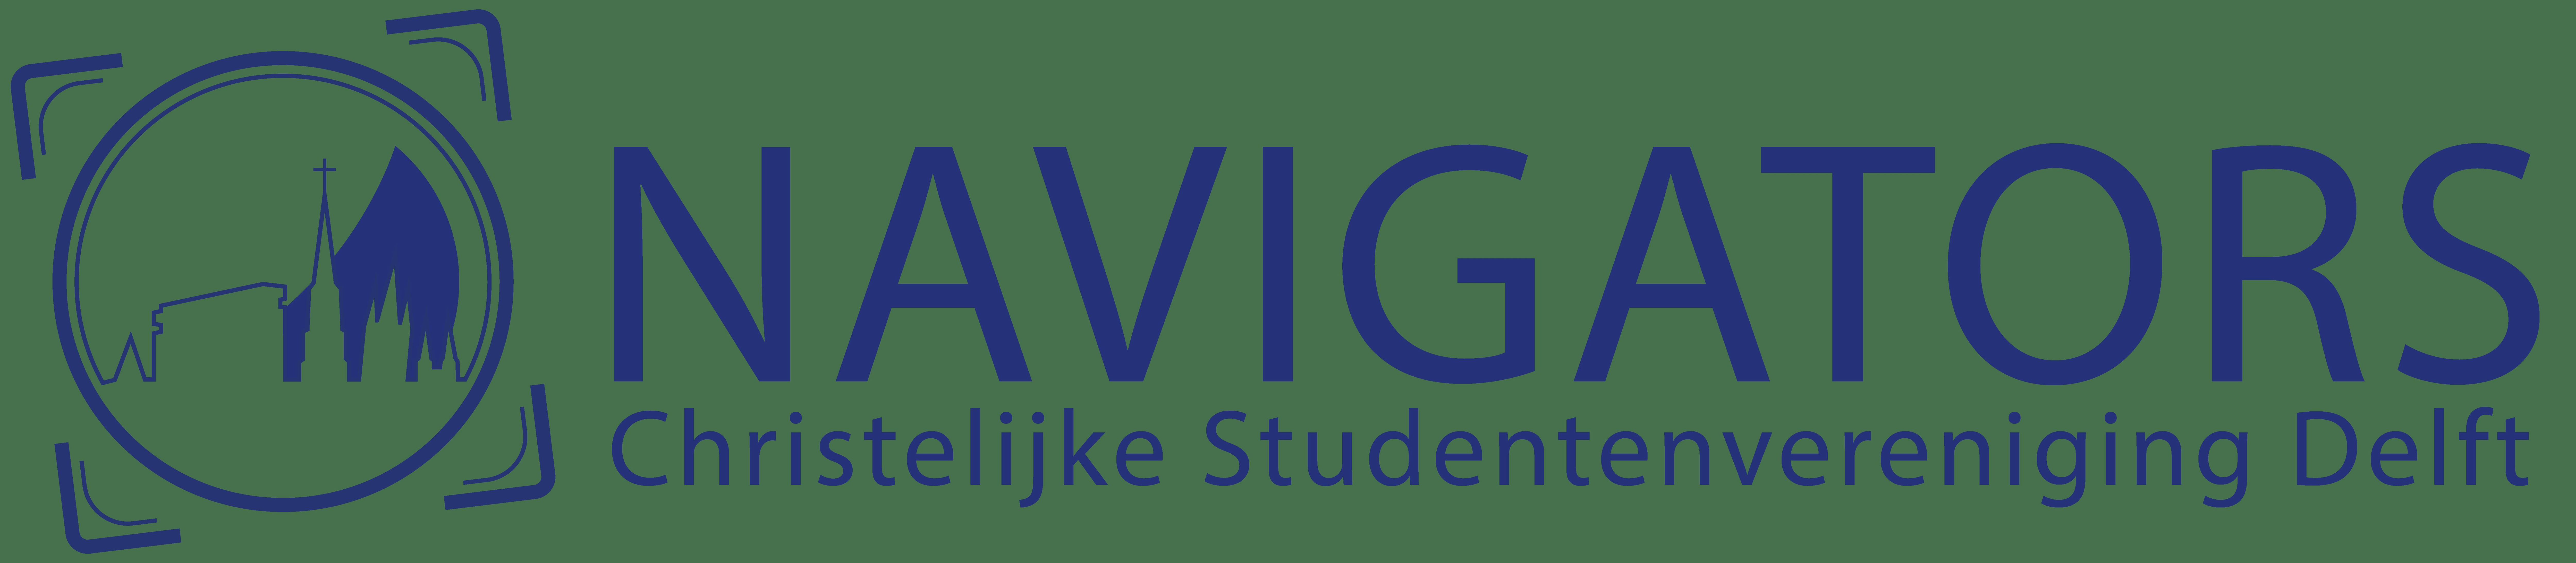 Navigators Studentenvereniging Delft